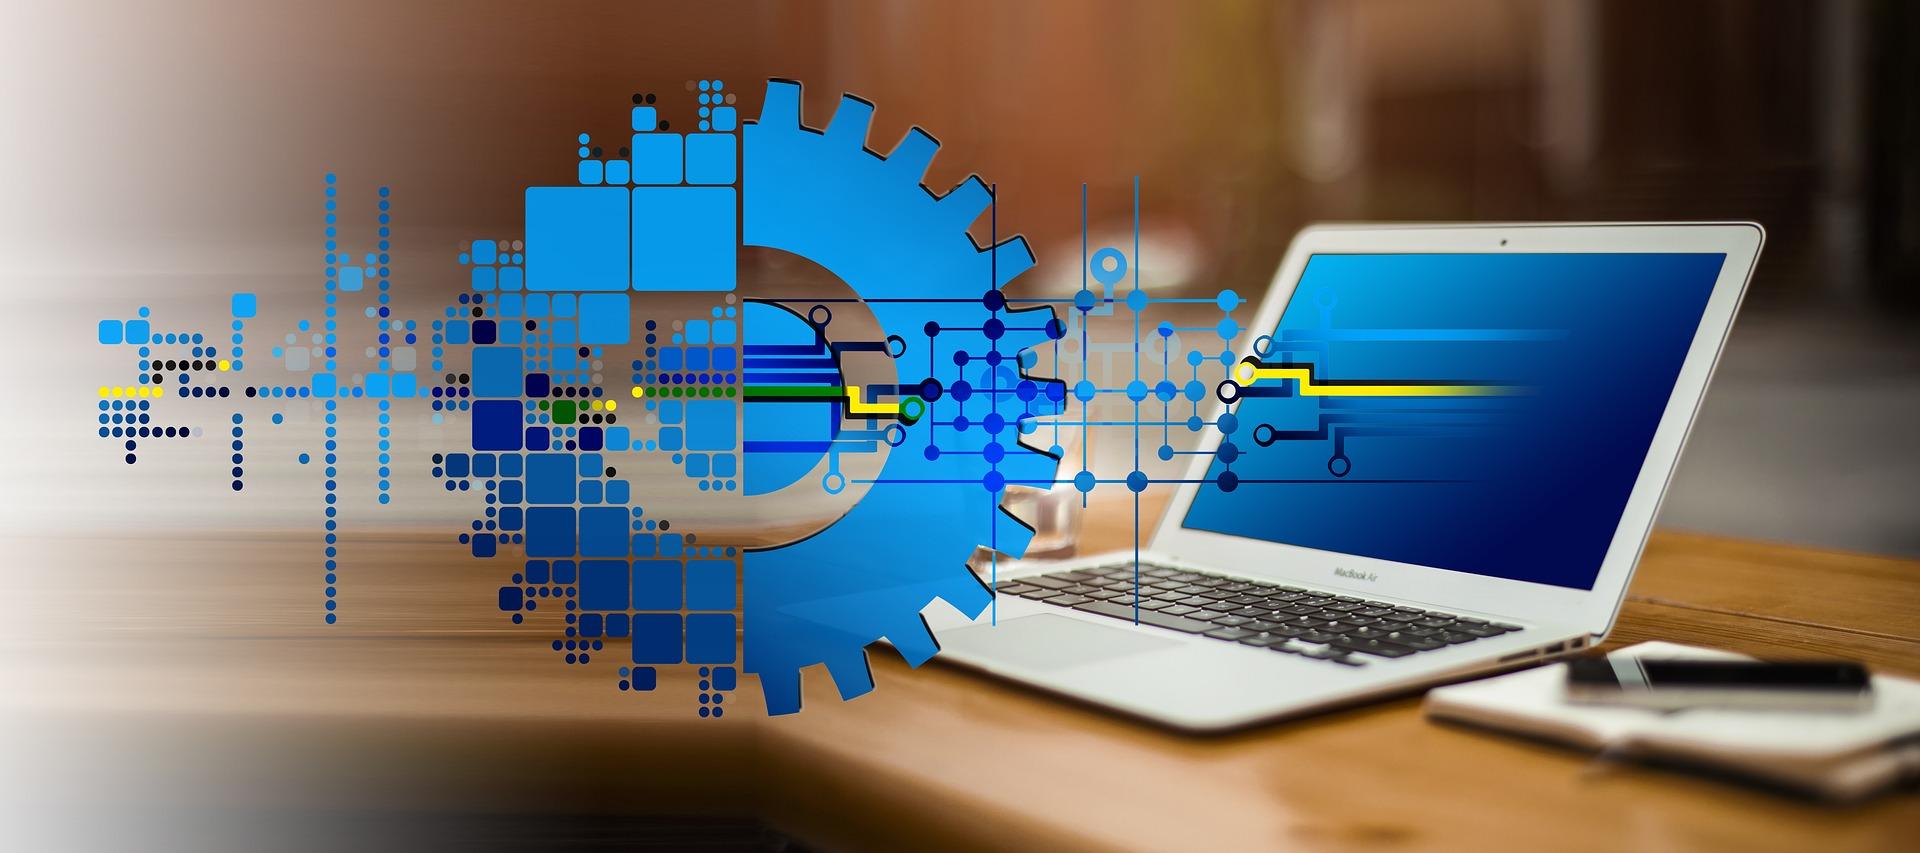 Juba City Council on digital transformation drive